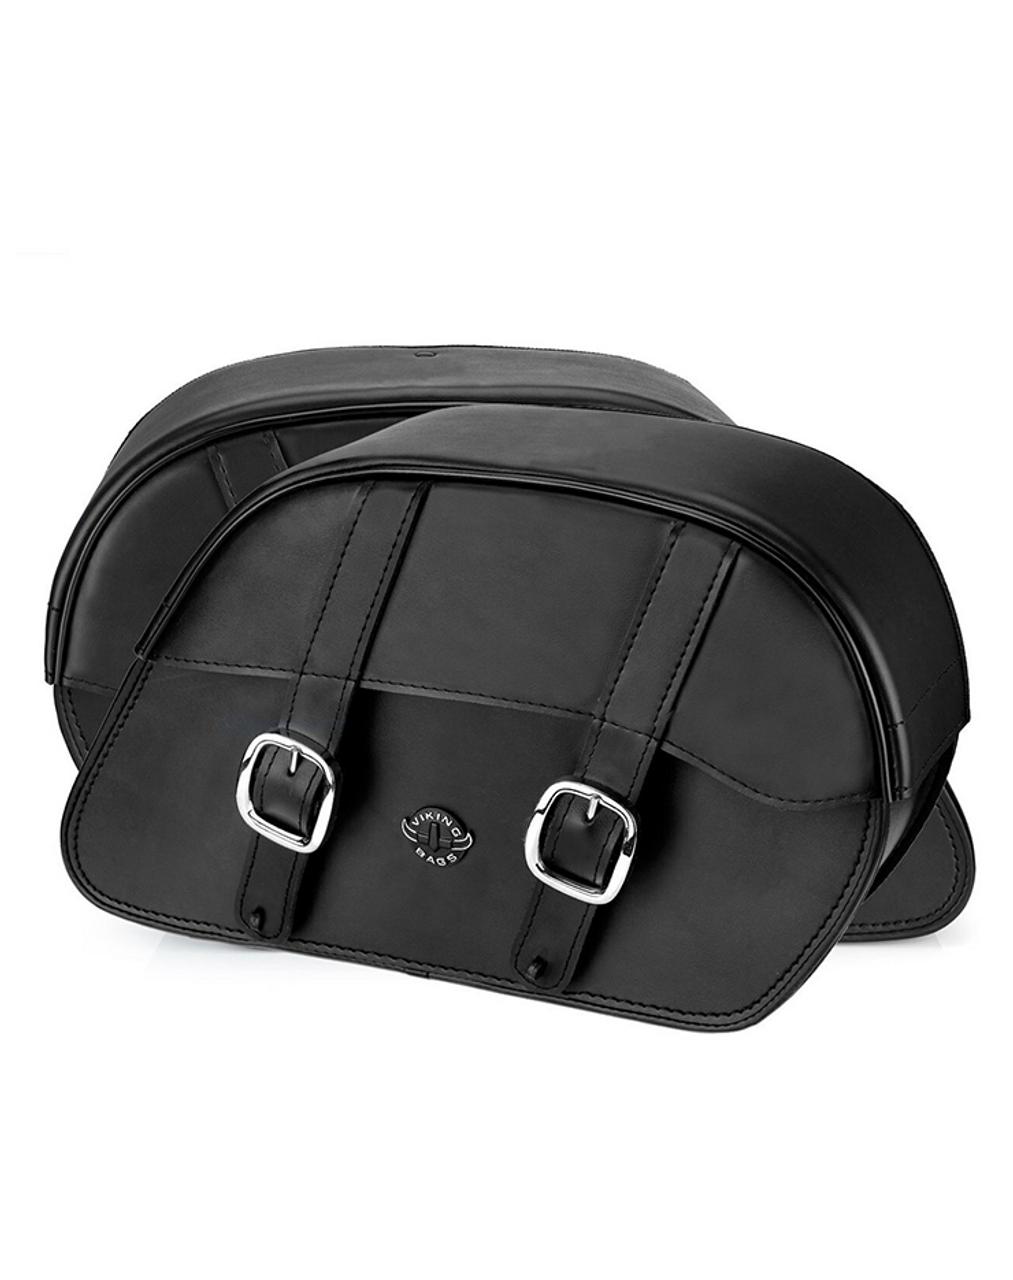 Viking Slant Medium Motorcycle Saddlebags For Harley Softail Fatboy FLSTF Both bag view